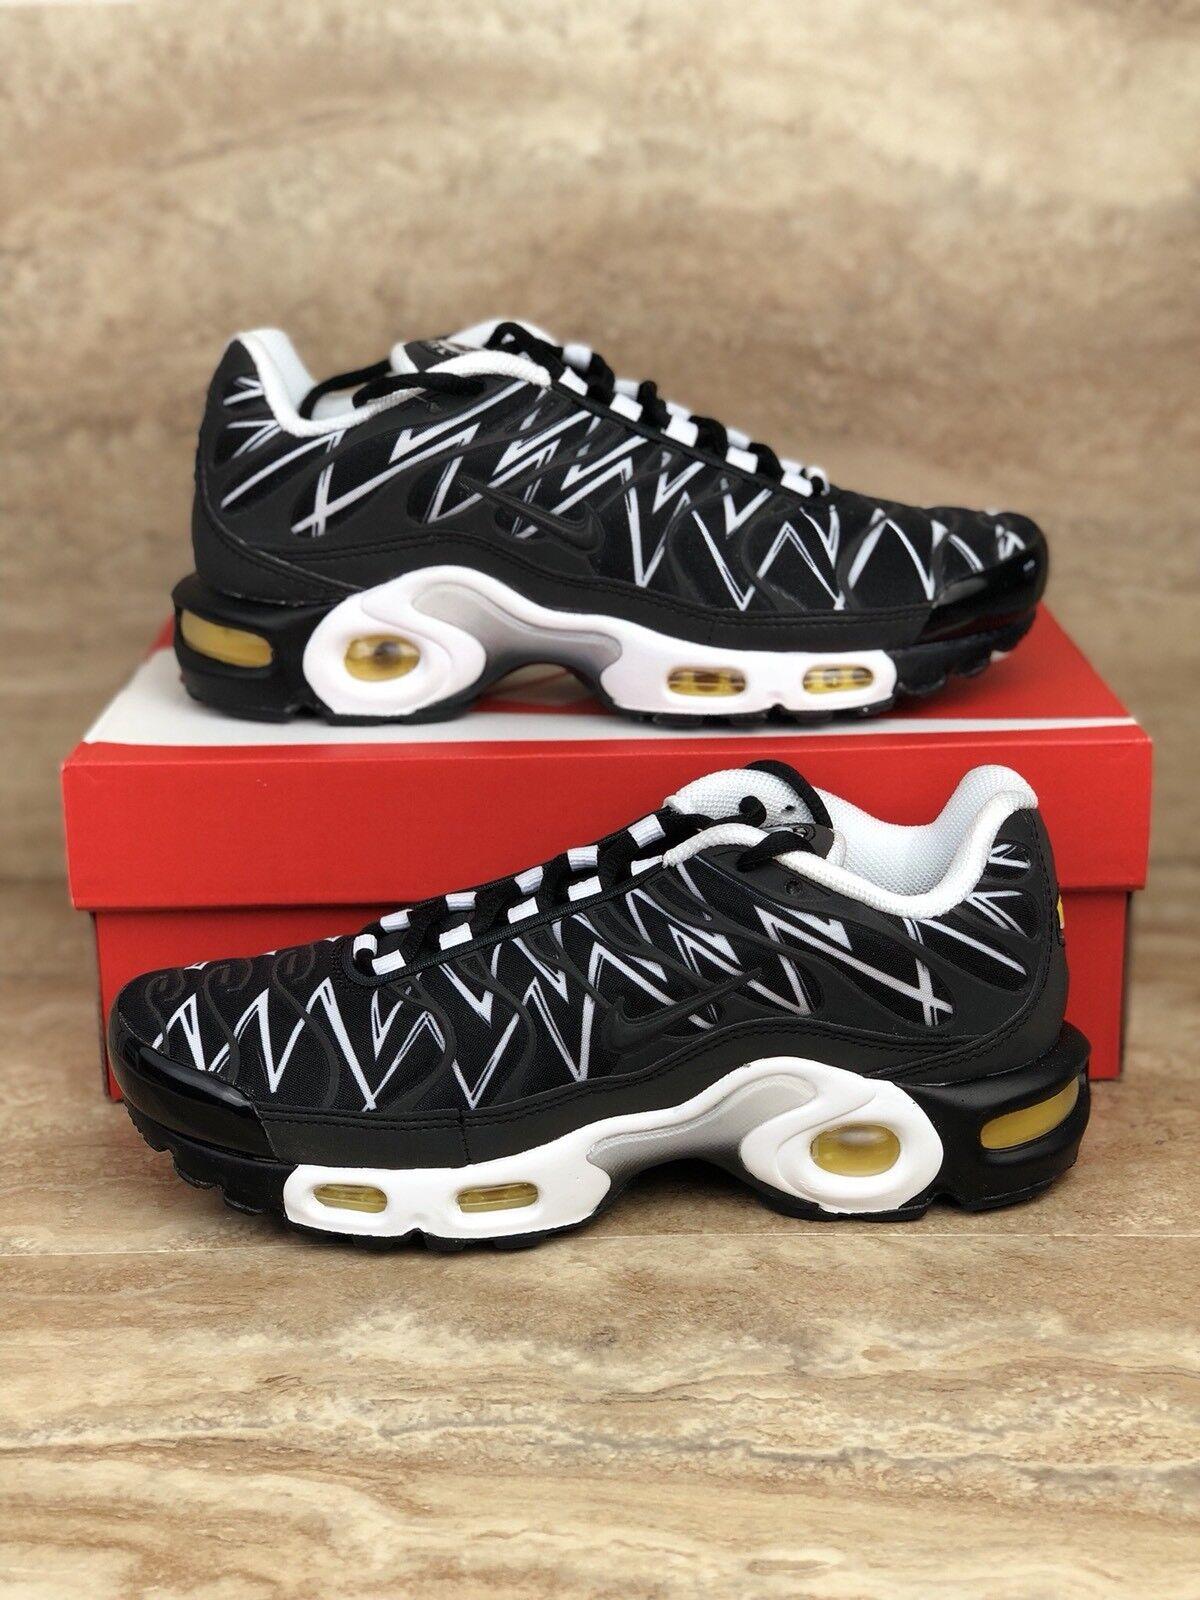 Nike Air En Jaune Uk 11 High Noir 1 Daim Retro Og Aj1 10 Jordan Ocre wOPX8n0k